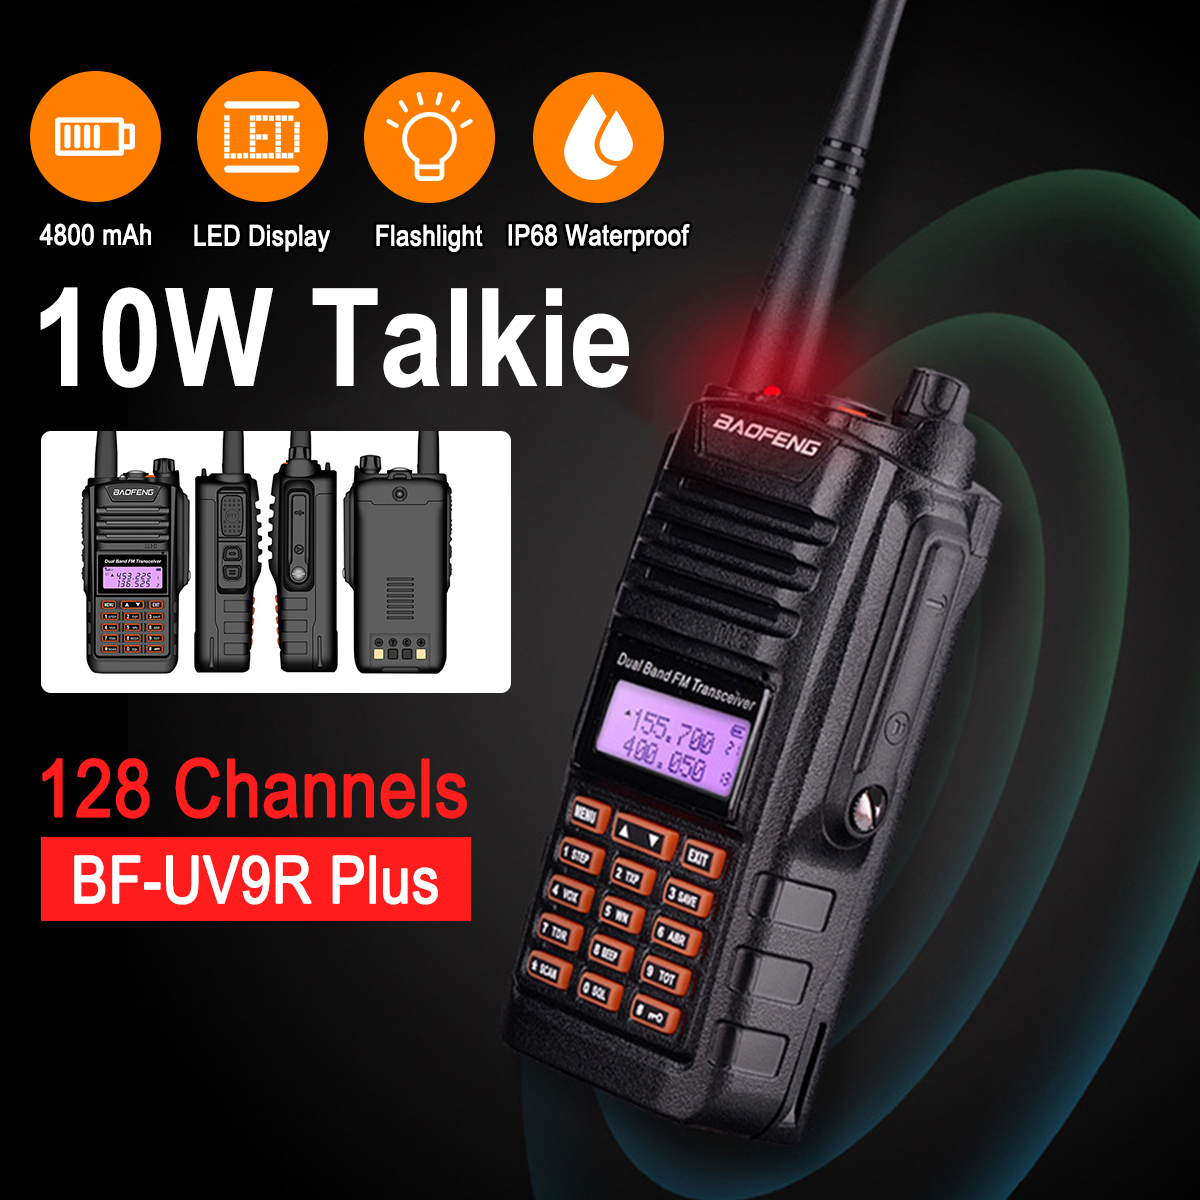 BF-UV9Rplus Walkie Talkie Dual Band Professional UV Two Way Radio Comunicador HF Transceiver Radio Station IP67 Waterproof